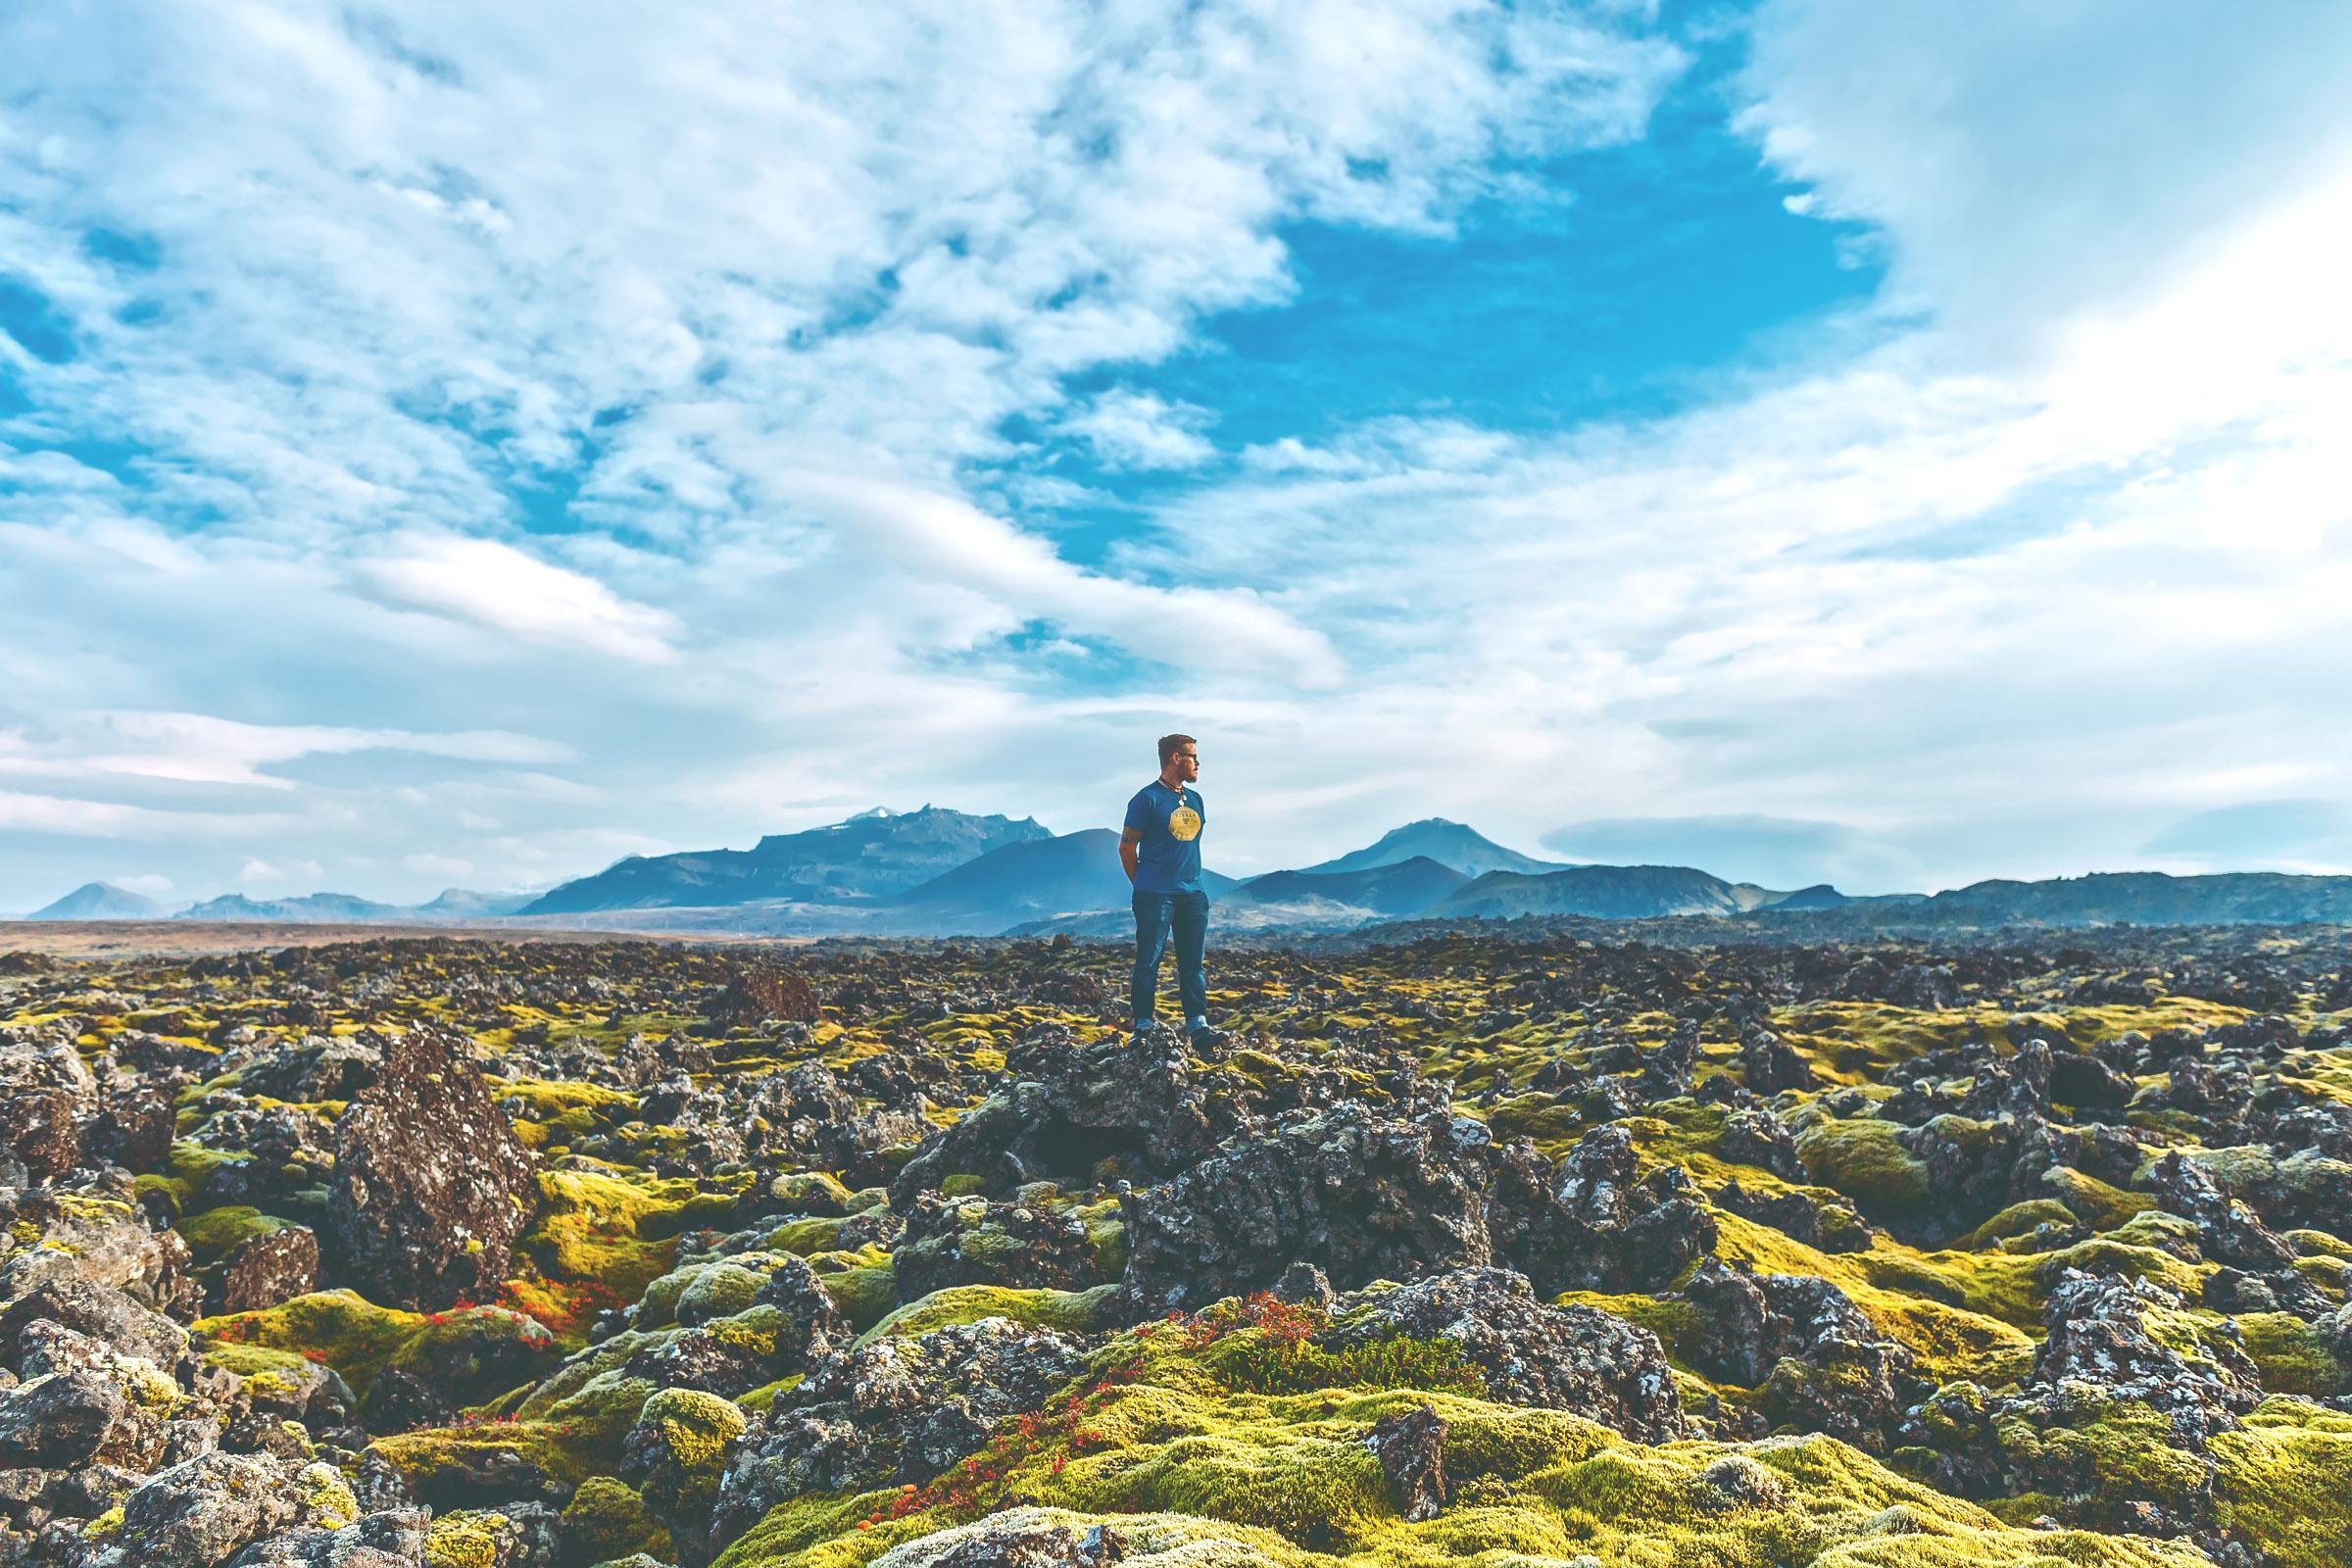 iceland landscape, jennifer picard photography, creative travel photography